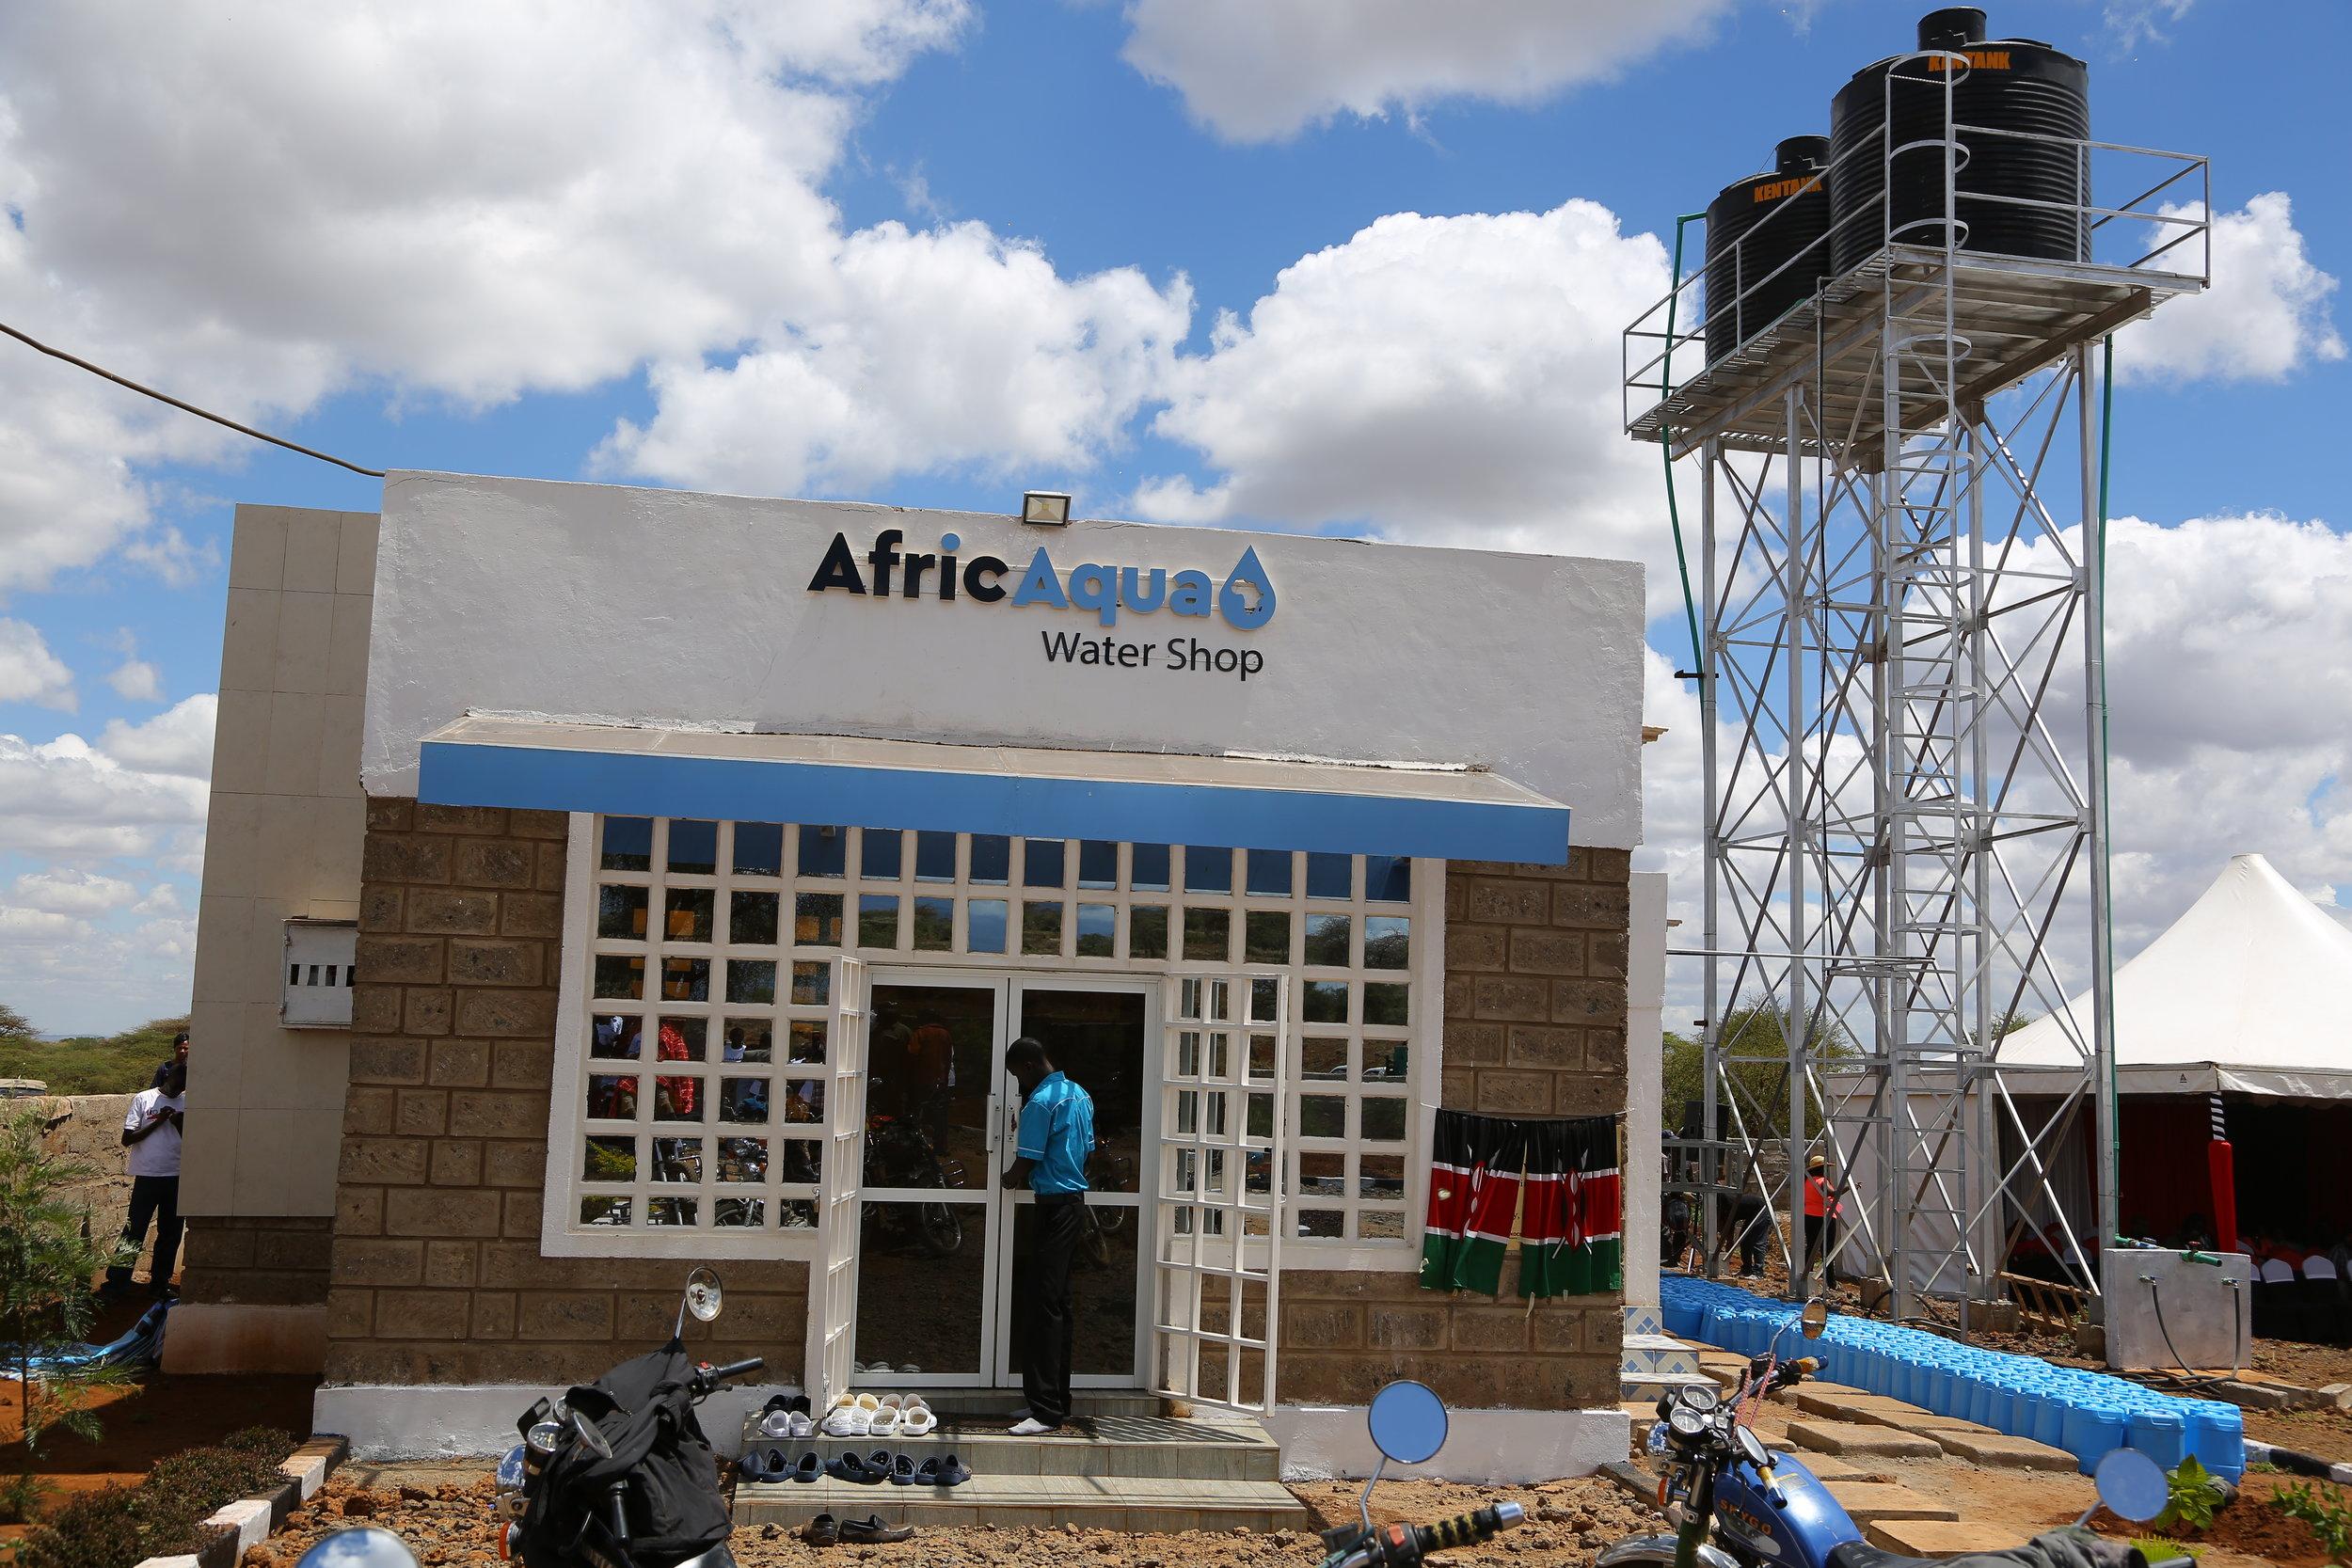 AfricAqua Kenya